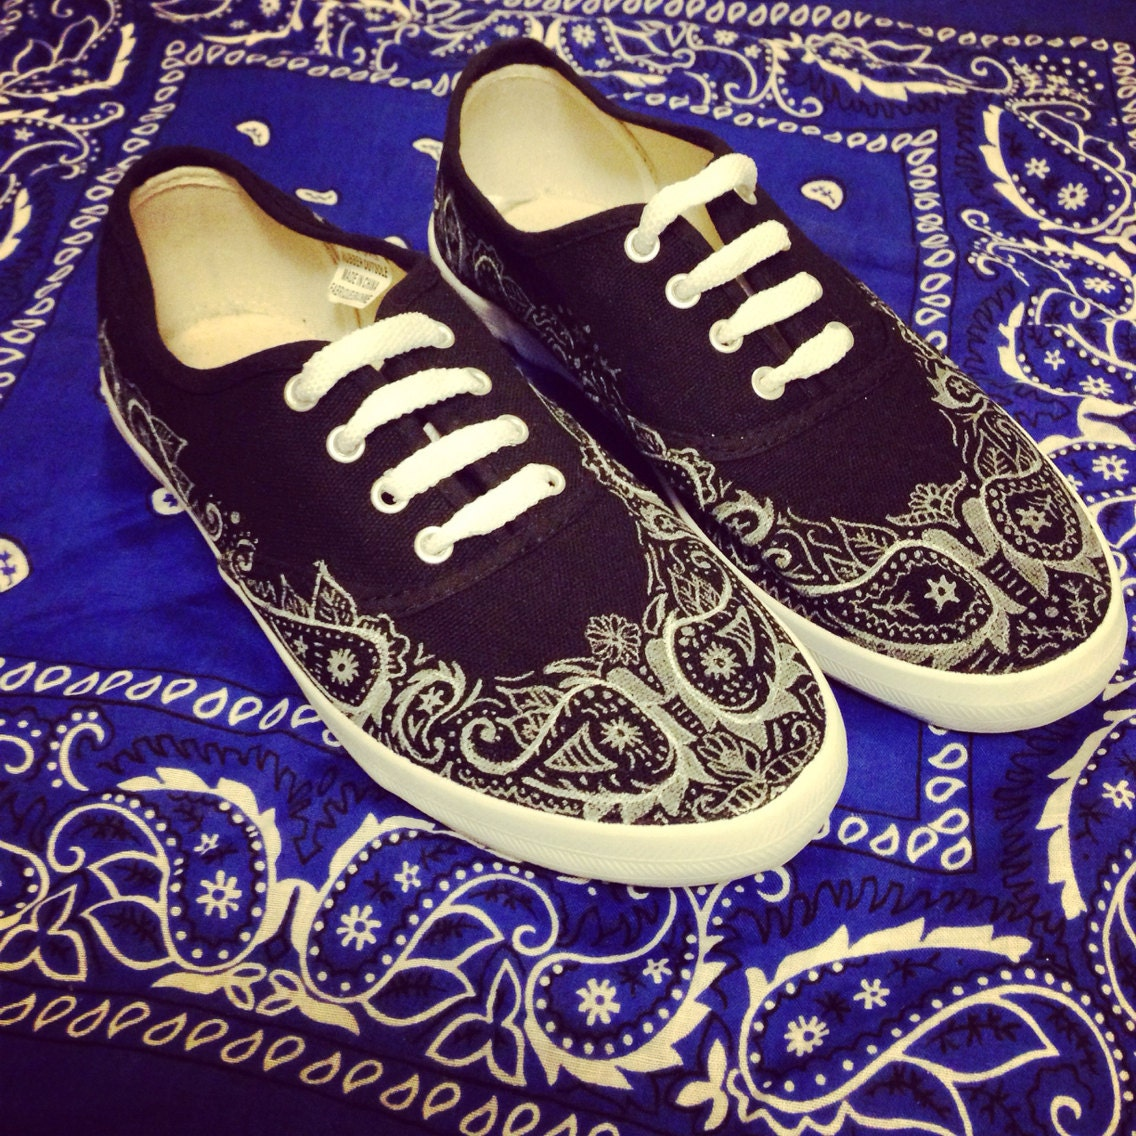 bandana patterned canvas shoes by etsybyveasey on etsy